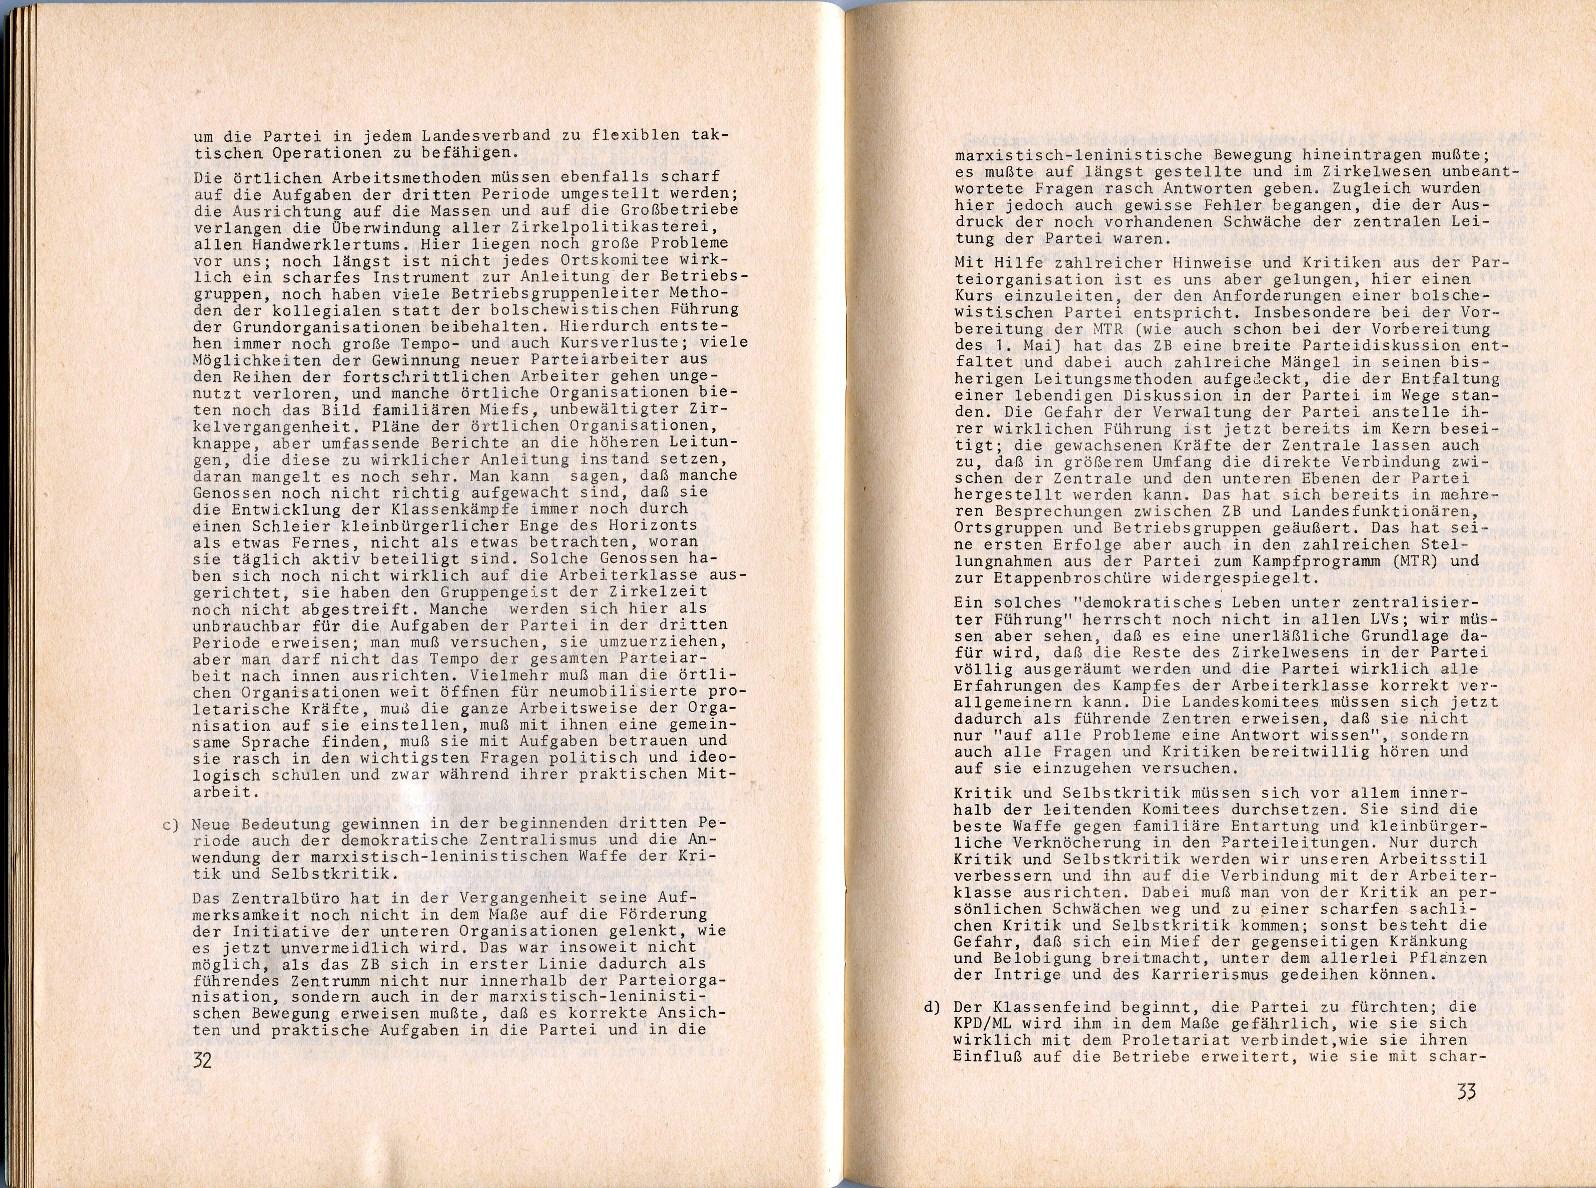 ZB_Parteiarbeiter_1971_07_18